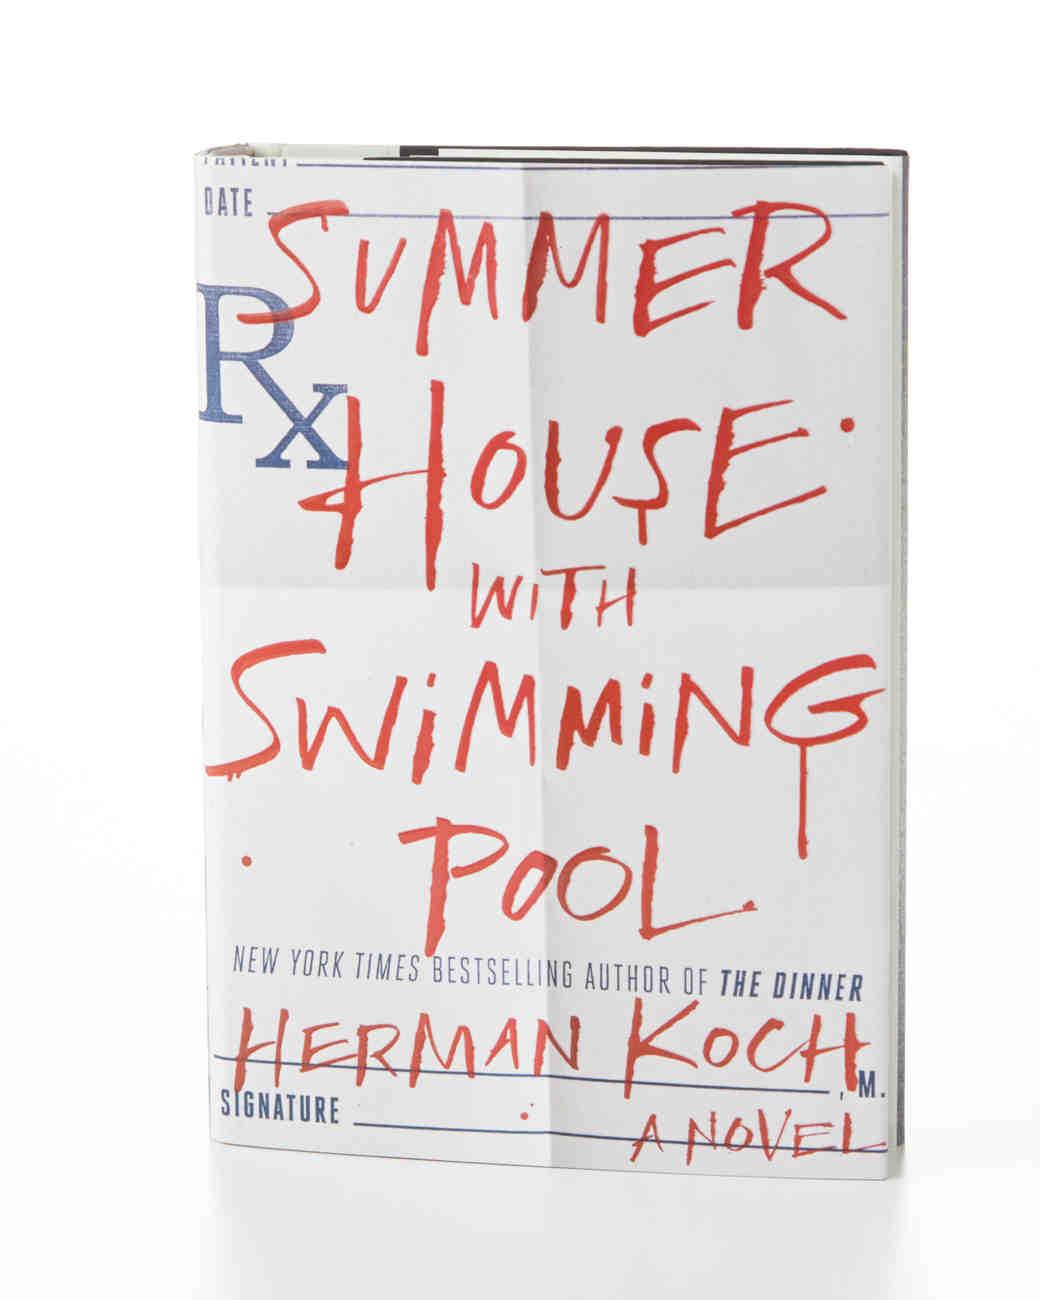 honeymoon-book-ideas-herman-koch-0614.jpg